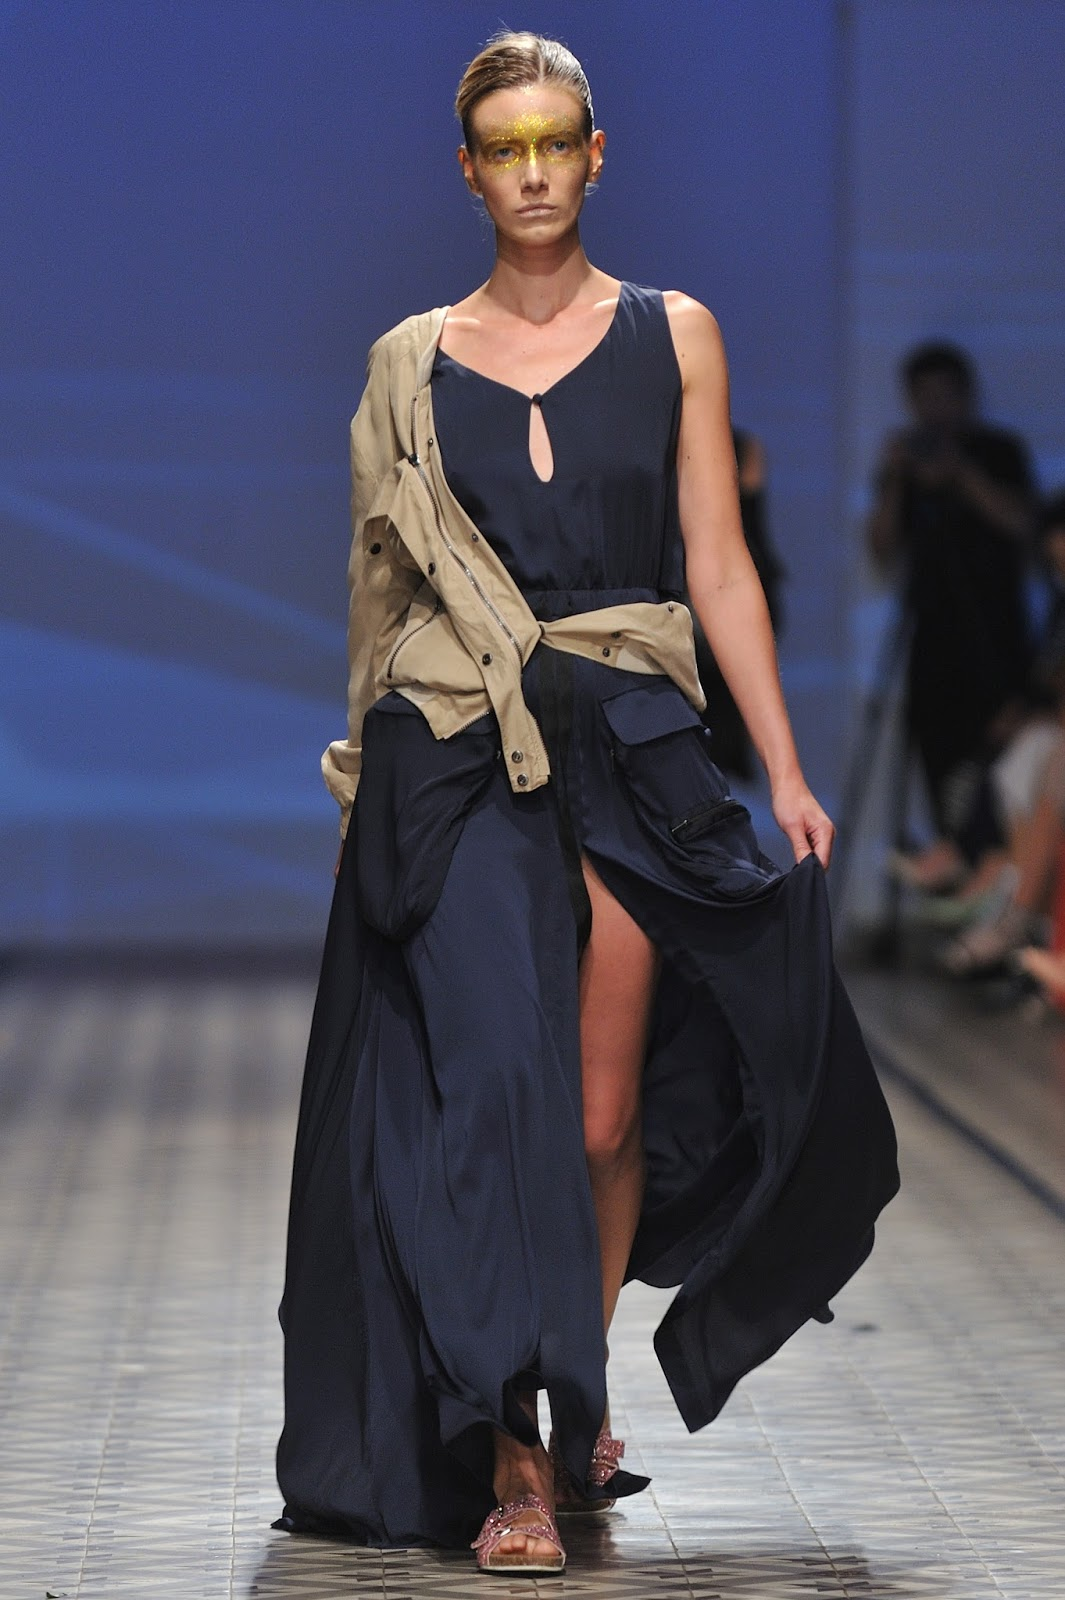 Andre kim fashion show 56